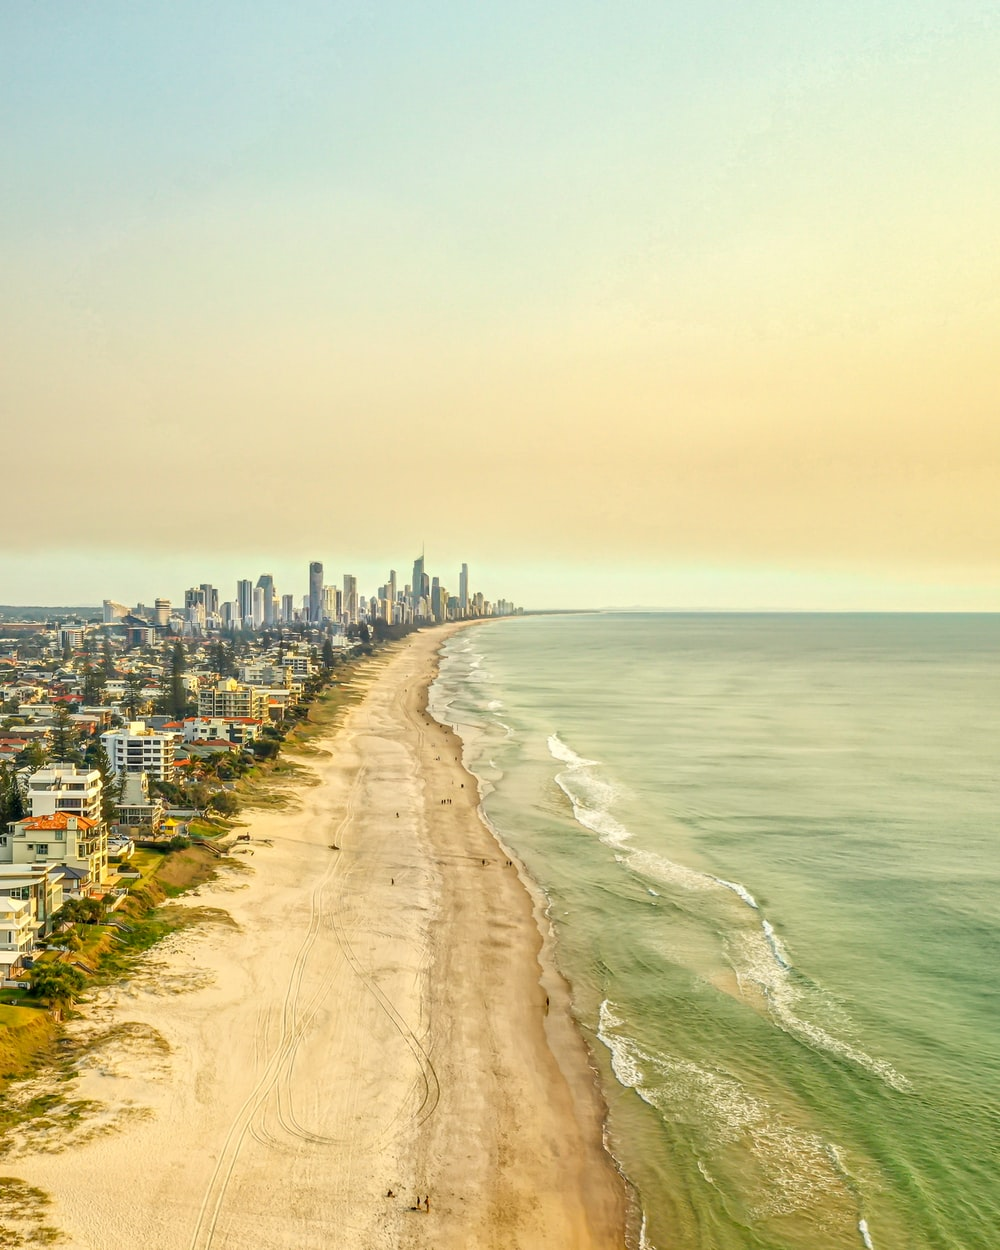 seashore besides city buildings photo